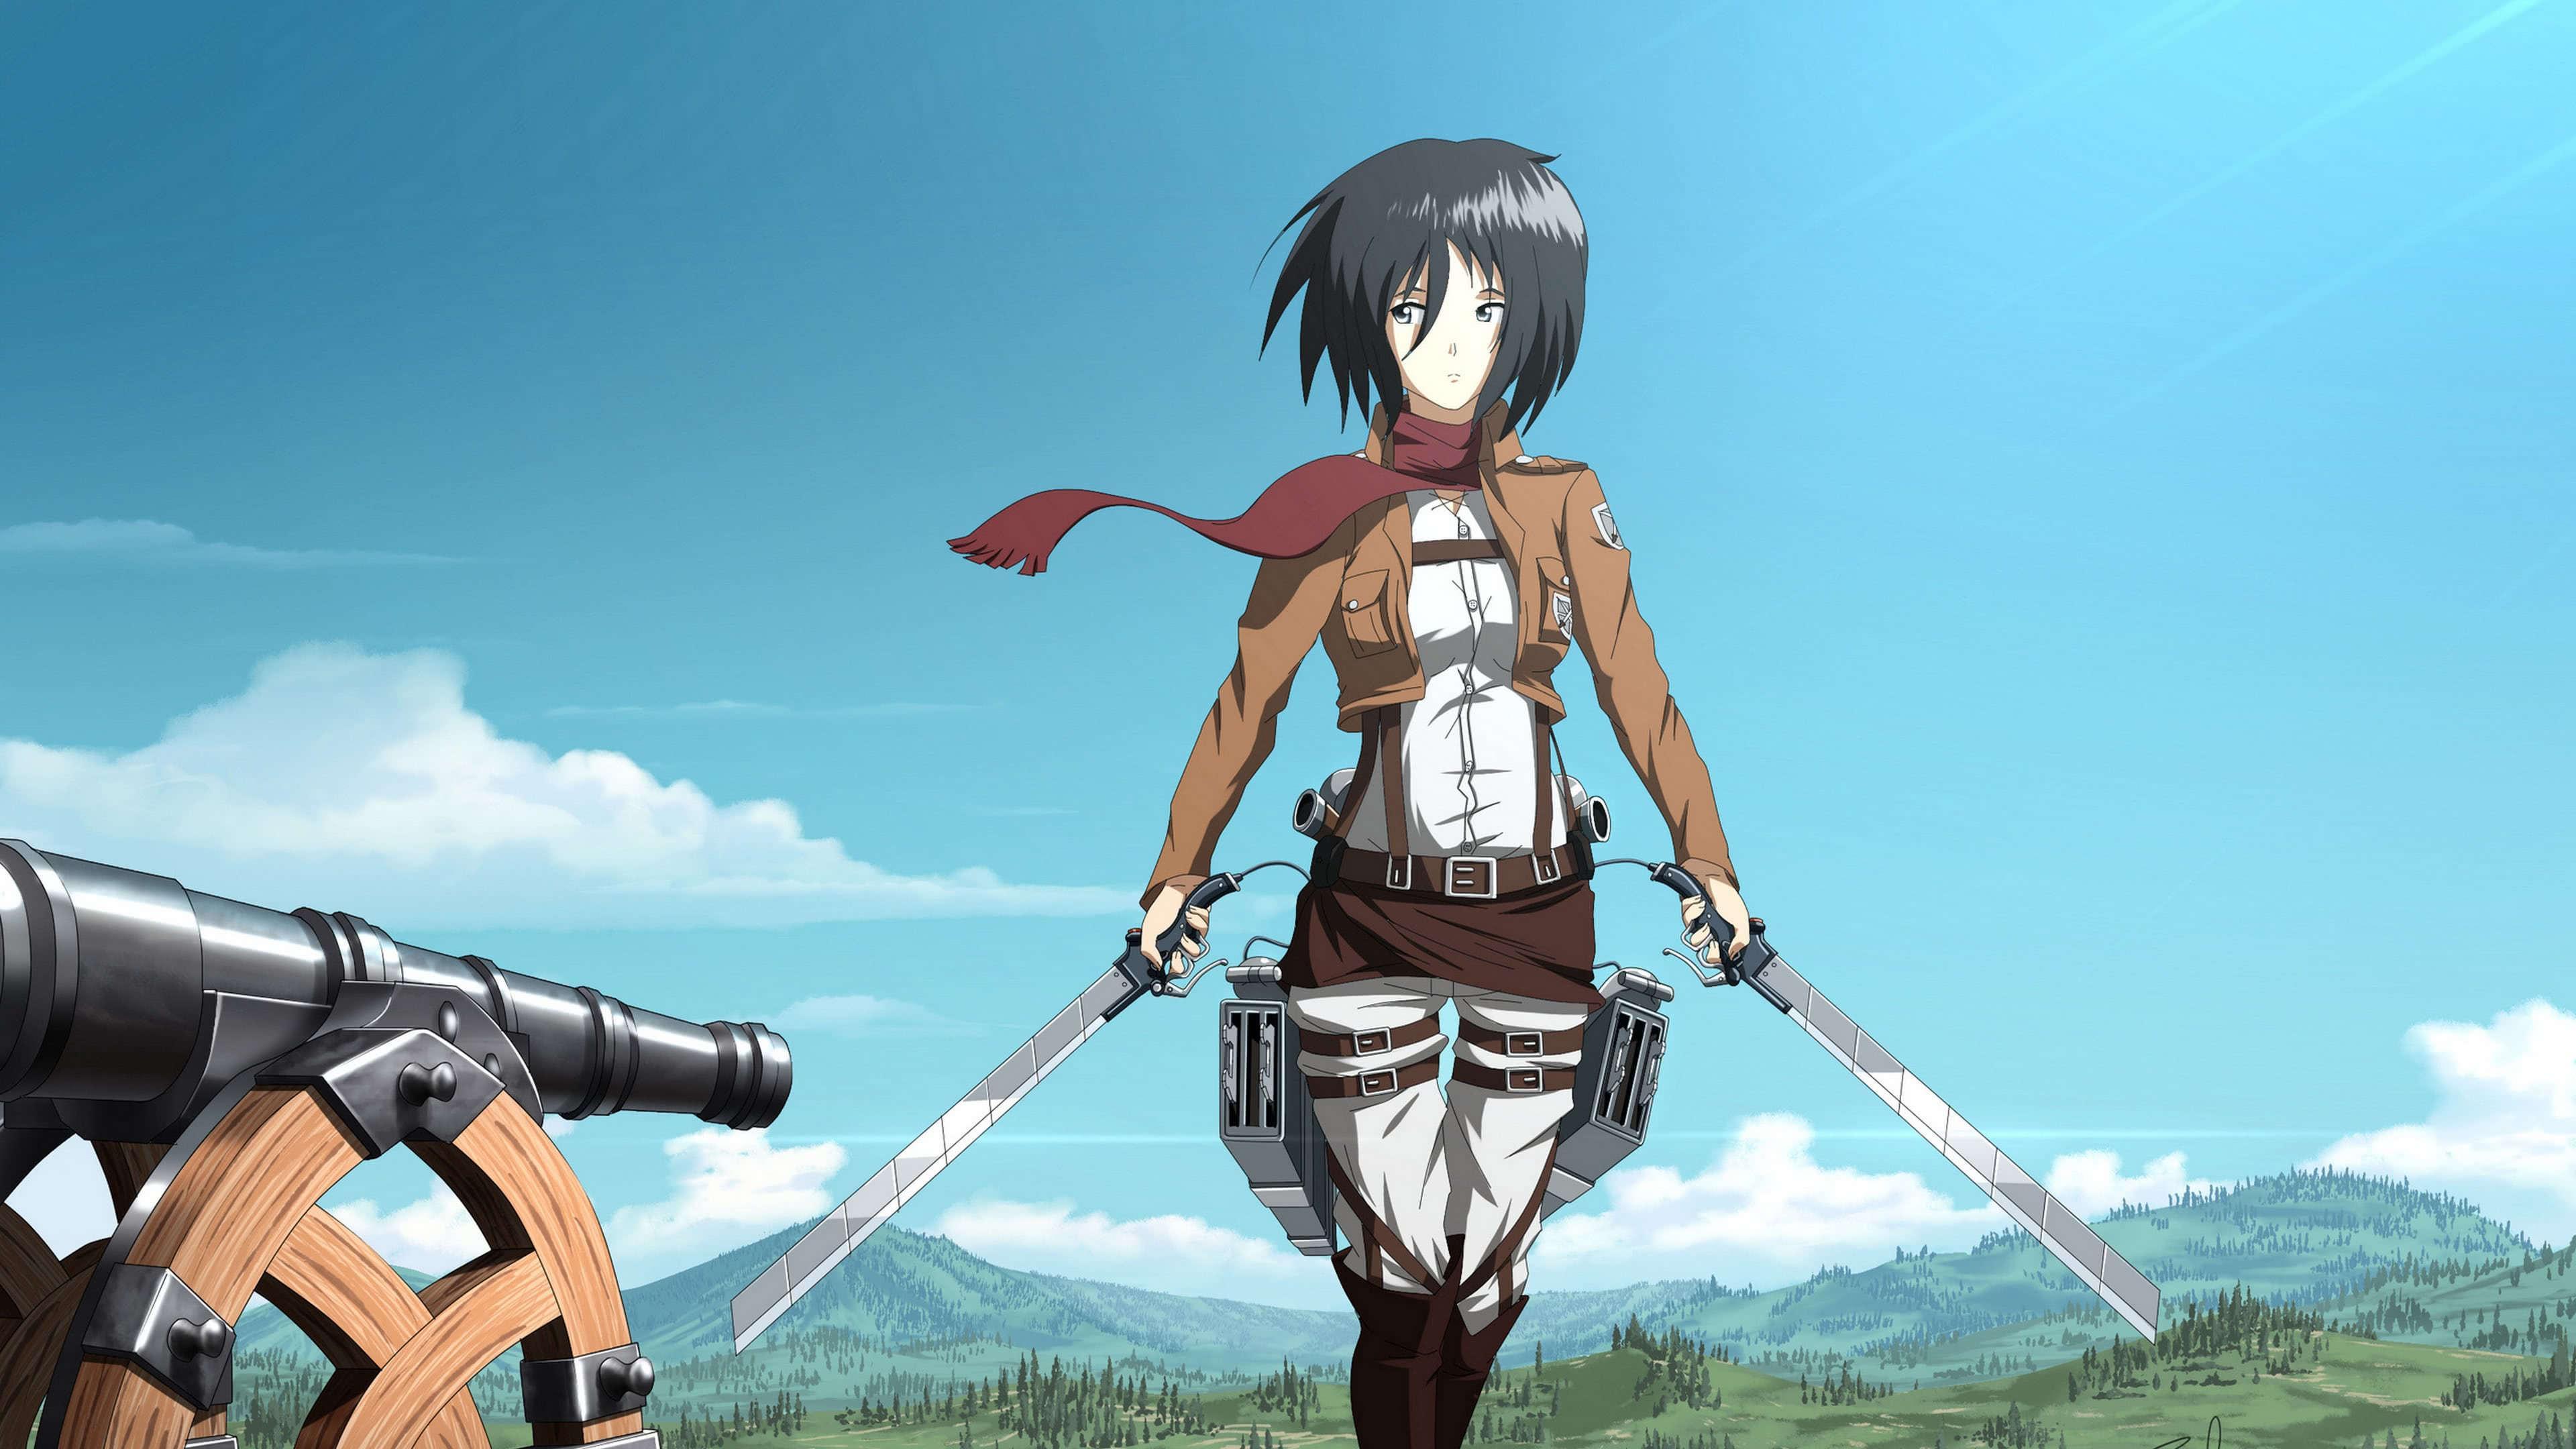 Attack On Titan Mikasa Wallpapers Top Free Attack On Titan